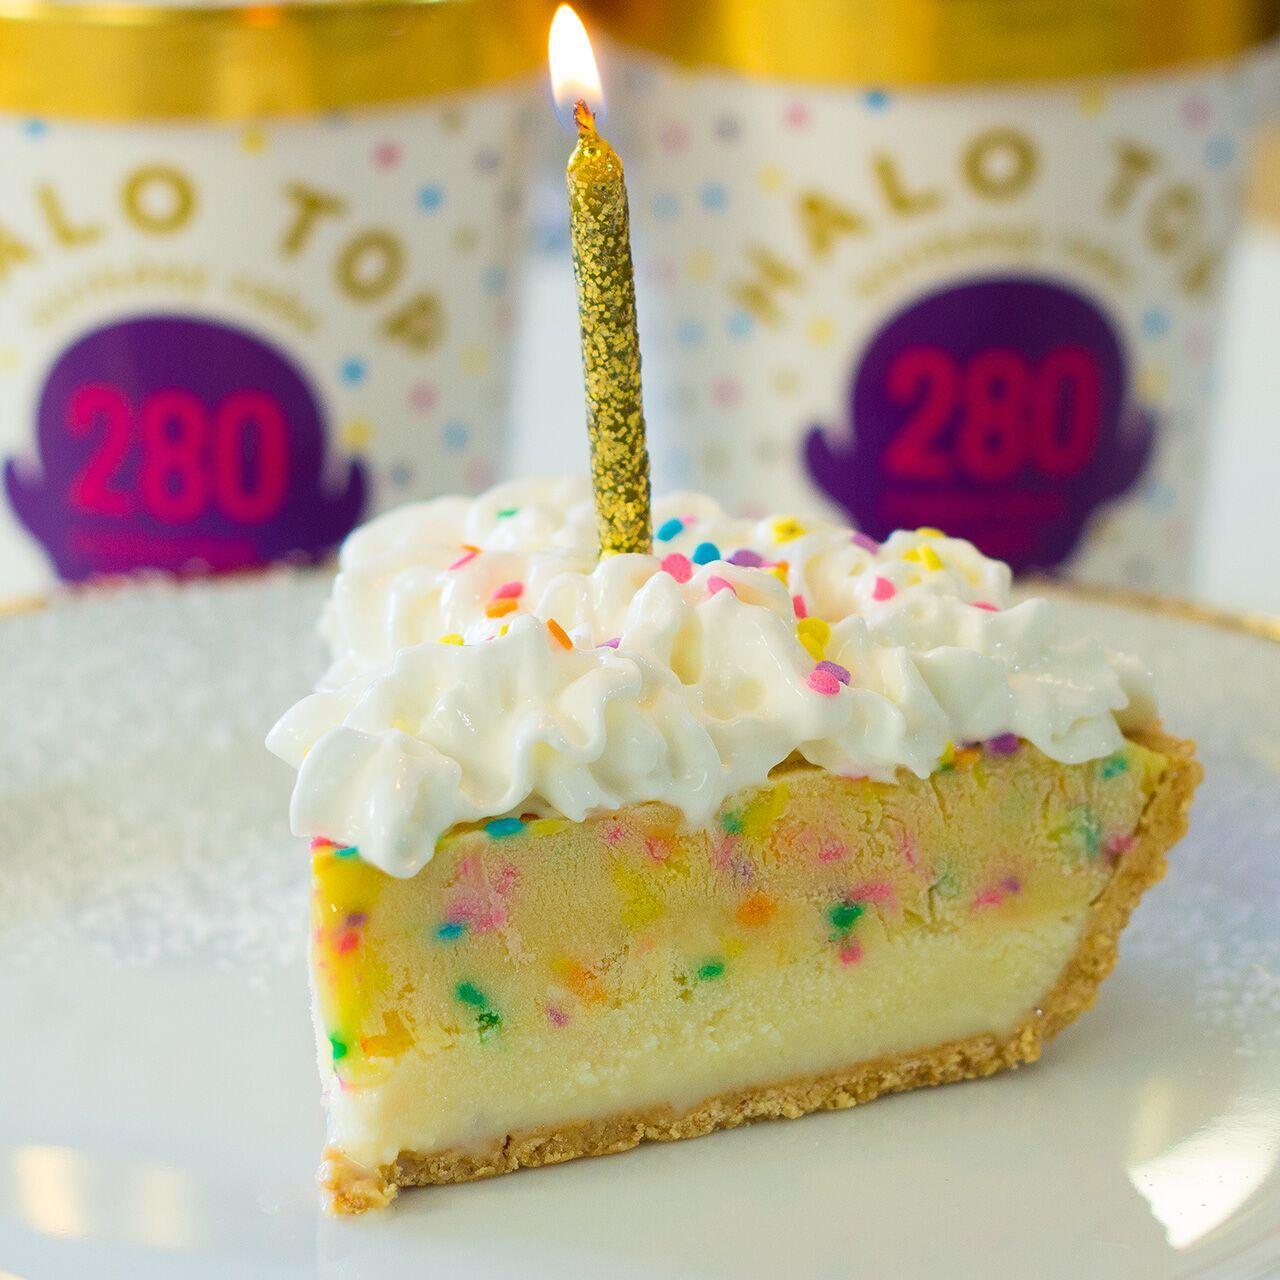 Happy Birthday Pie Using Halo Top Ice Cream Credits To Mr Cooking Panda YIELDS 1 PIE 10 SERVINGS